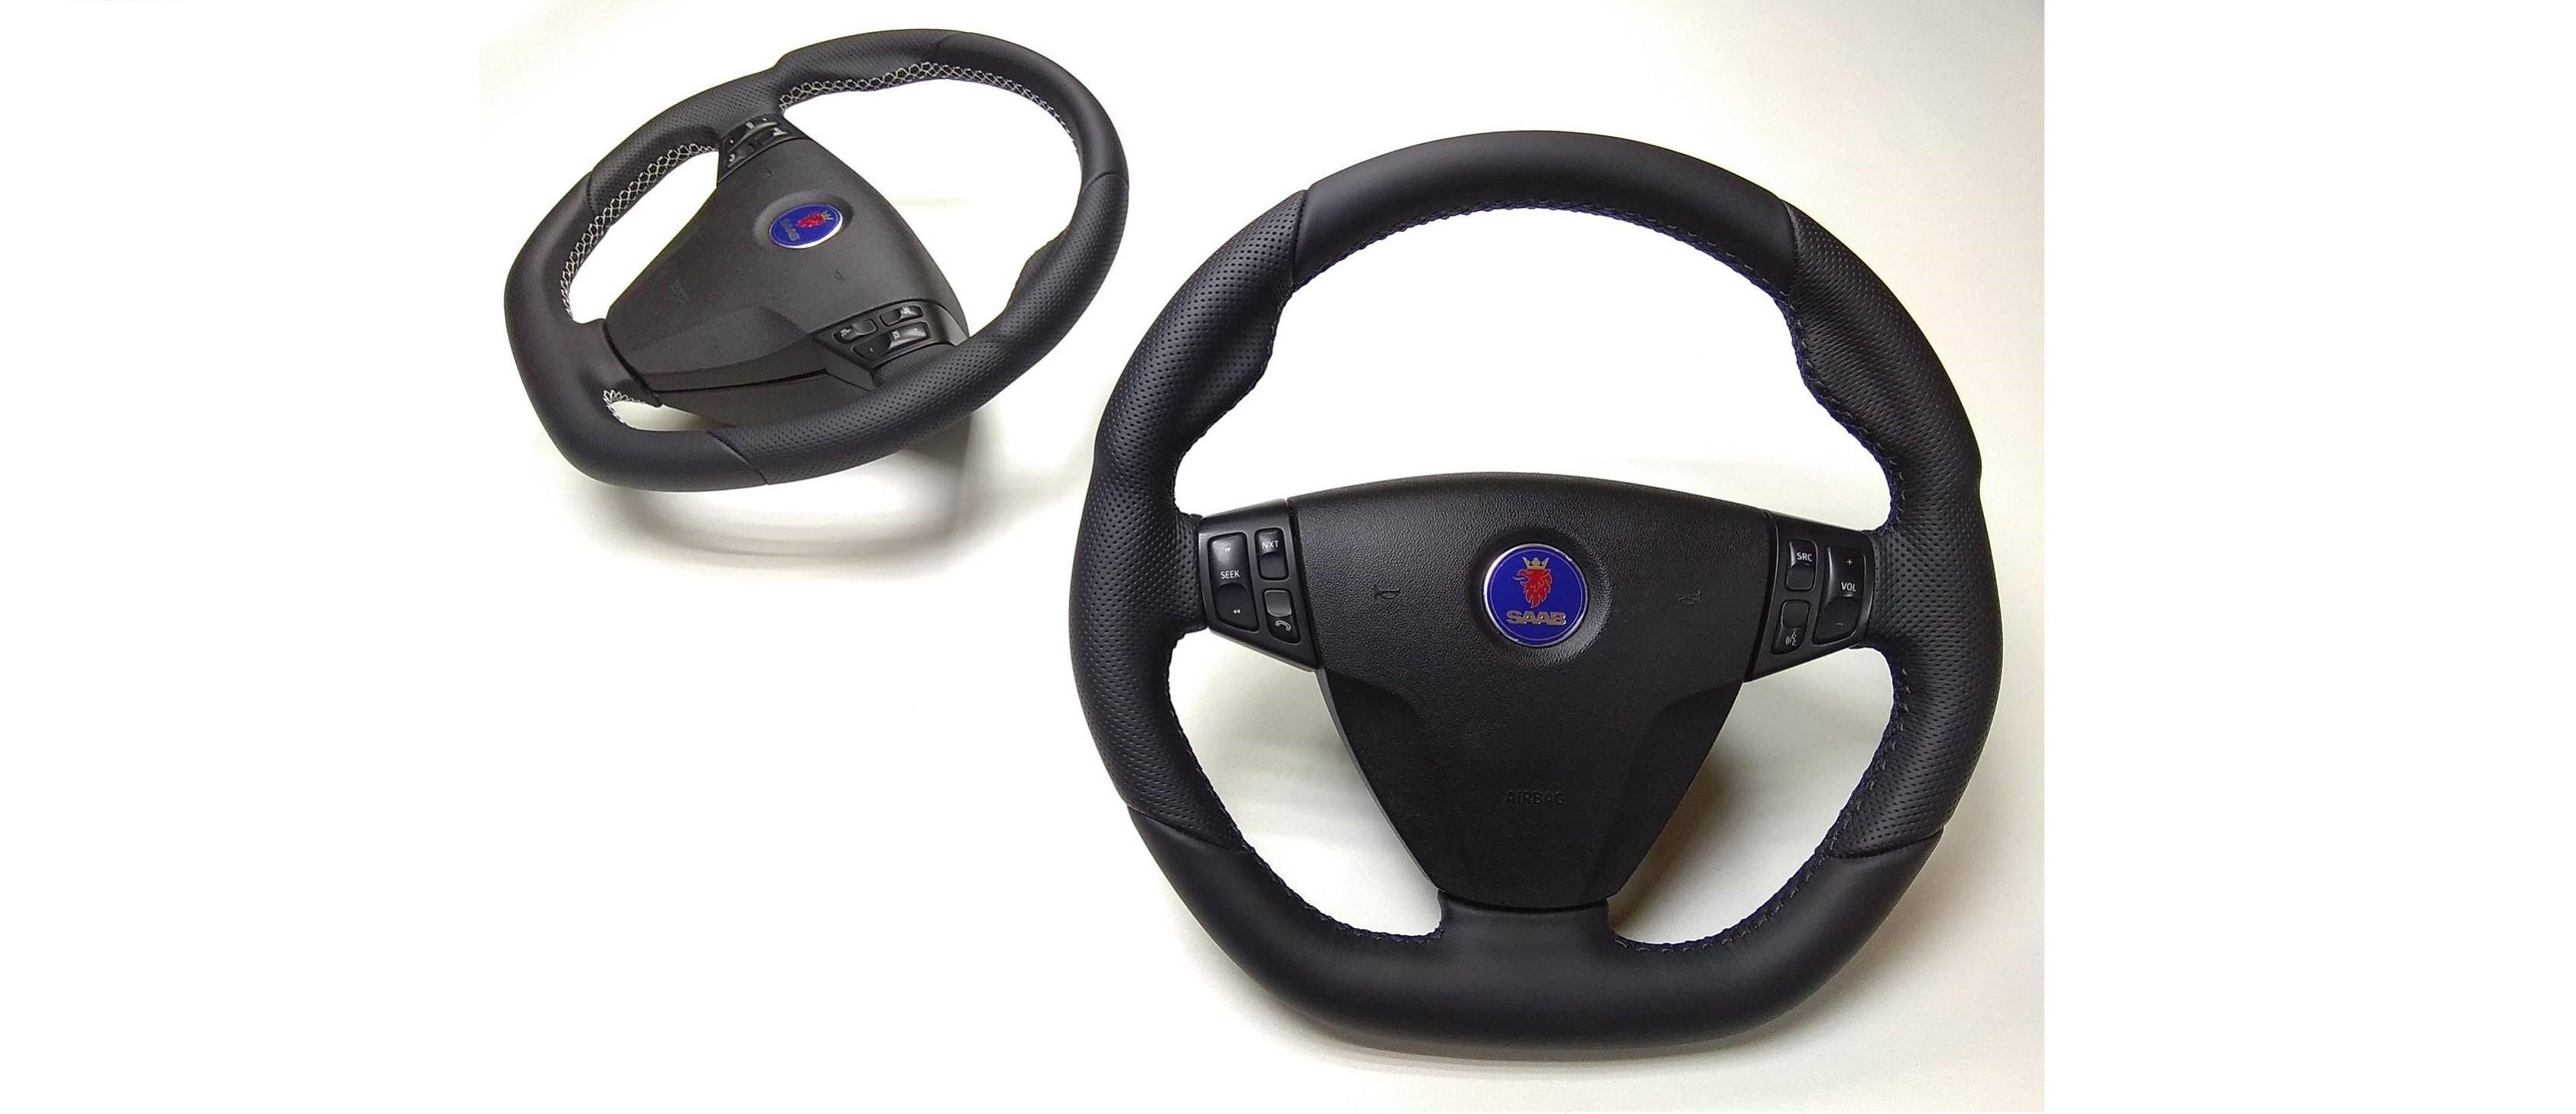 SAAB 9-3 steering wheels